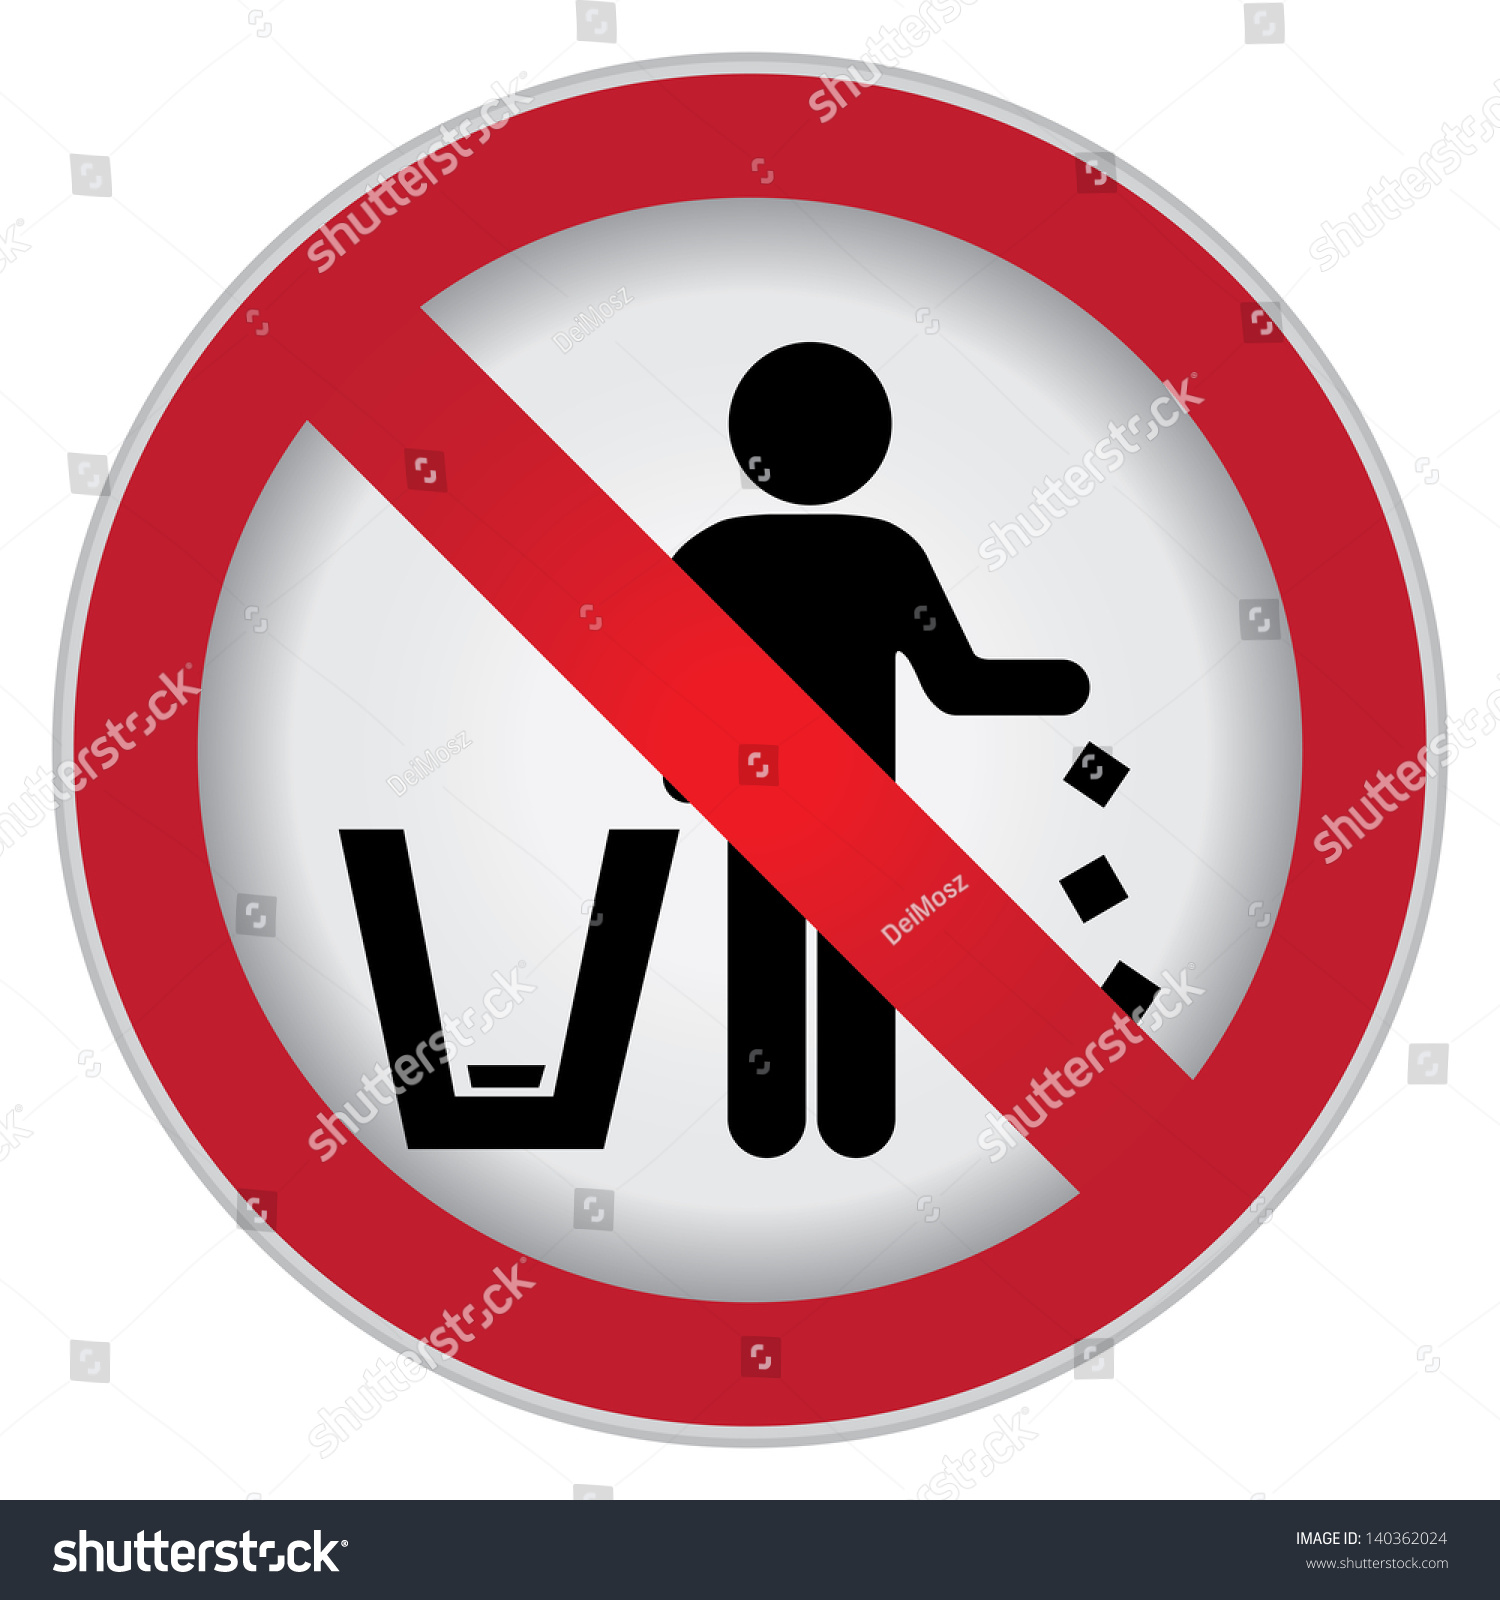 Royalty Free Stock Illustration Of Circle Prohibited Sign No